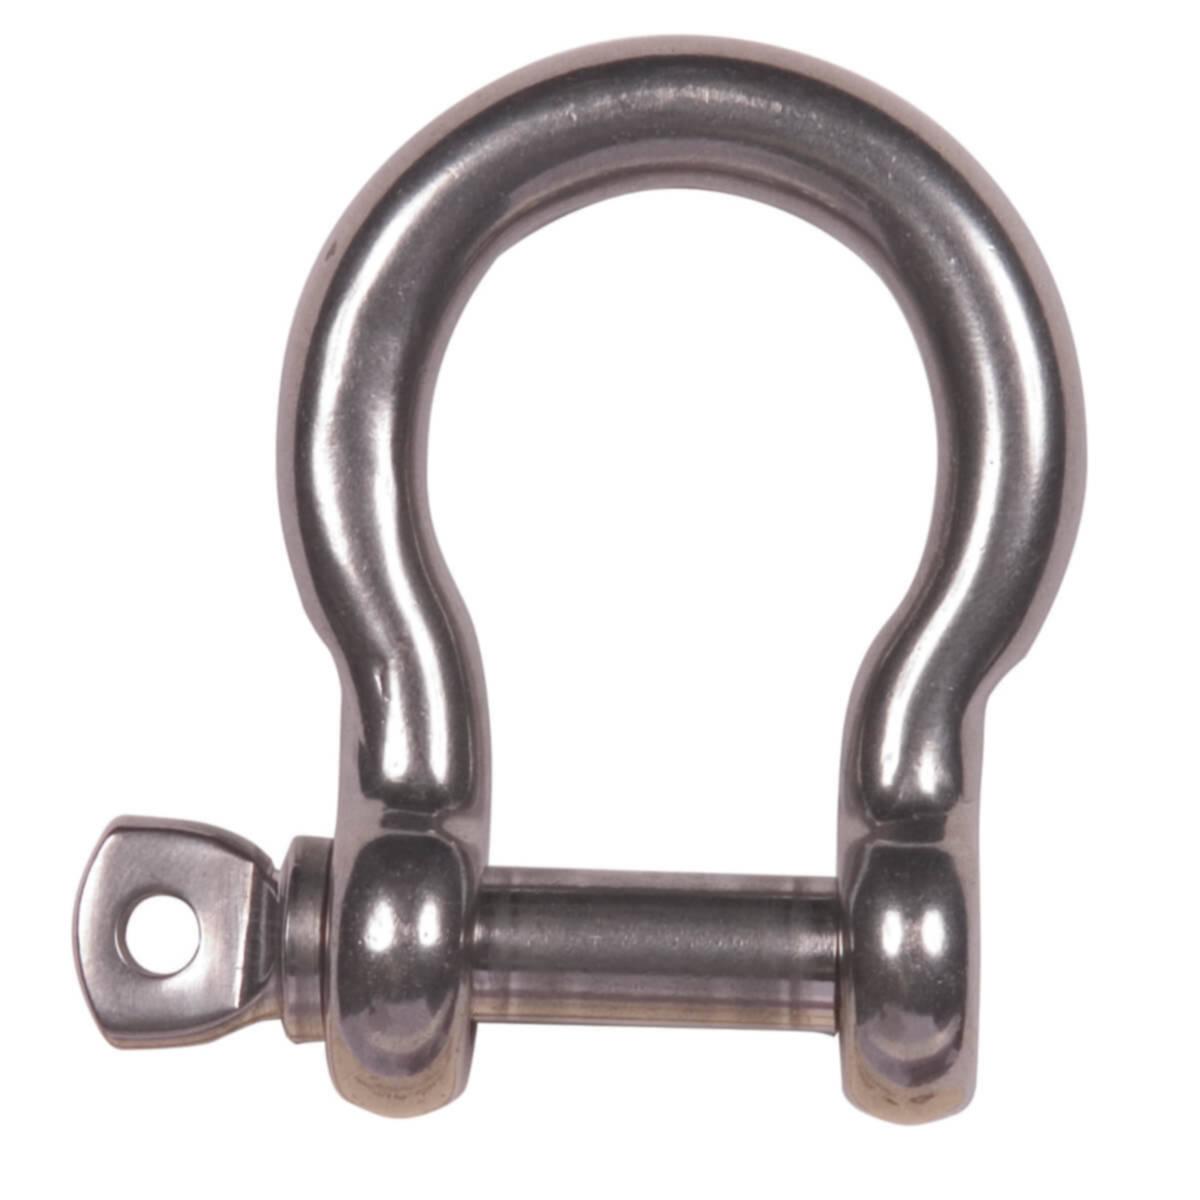 Ben-Mor Cables 70341